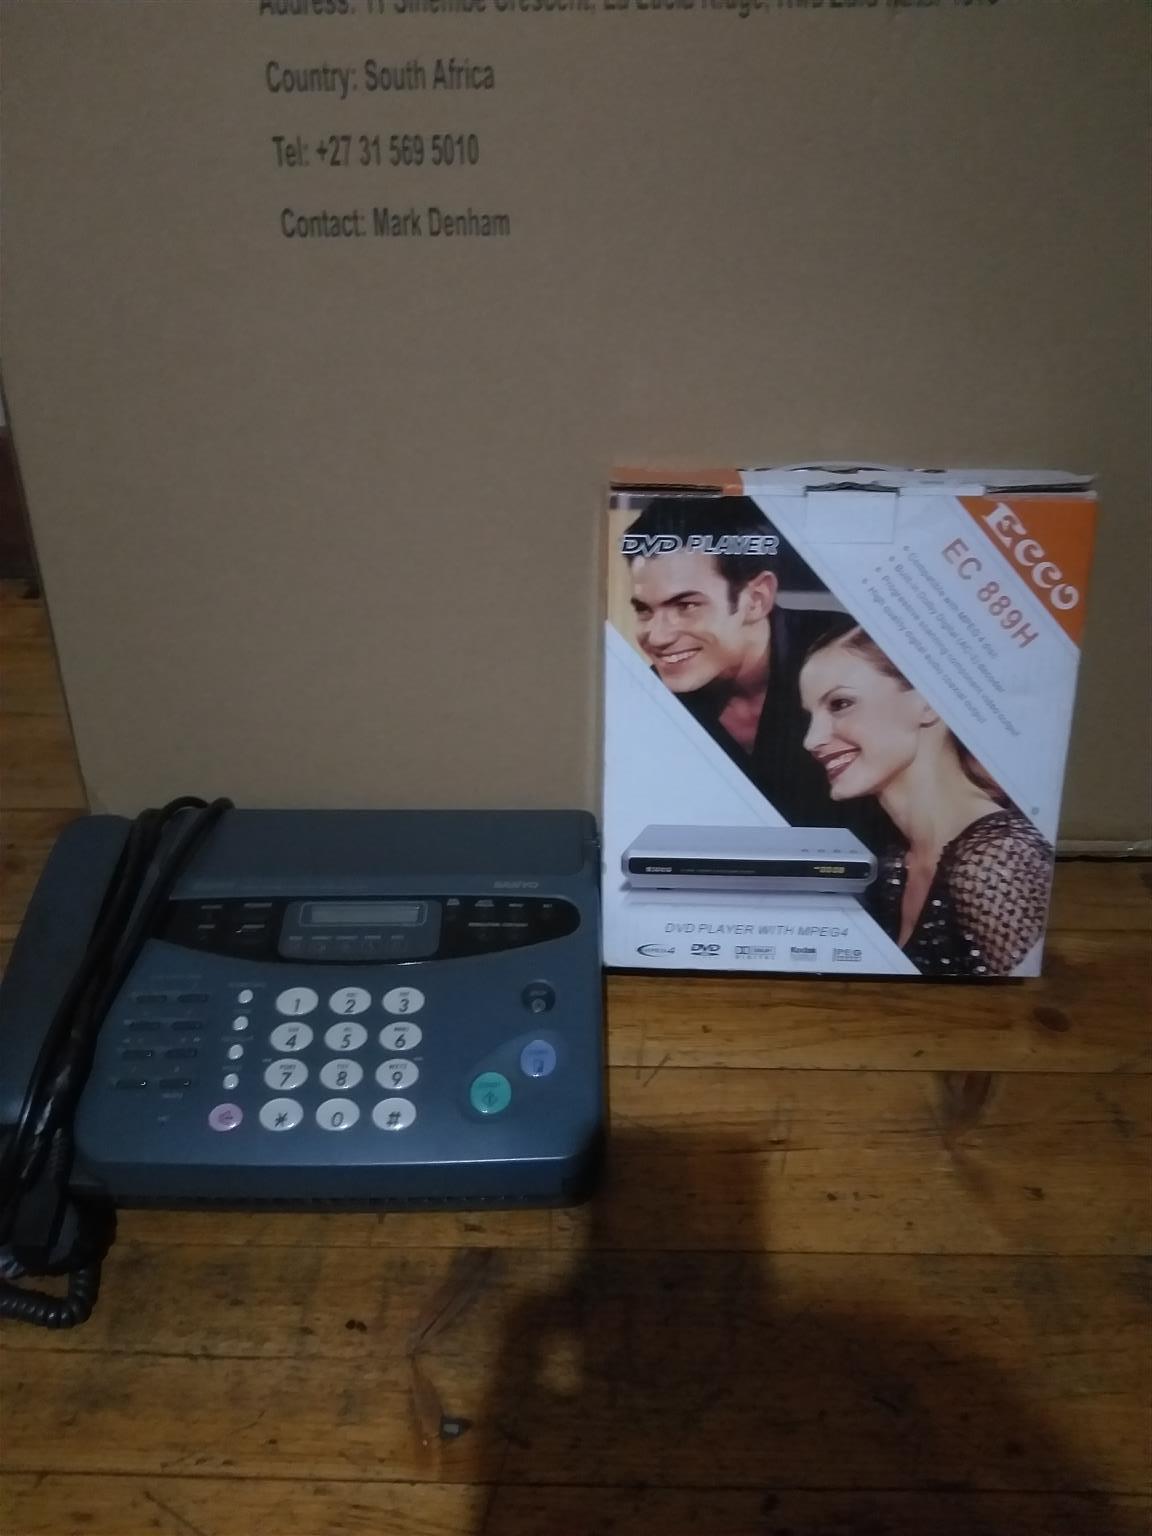 Fax plus dvd